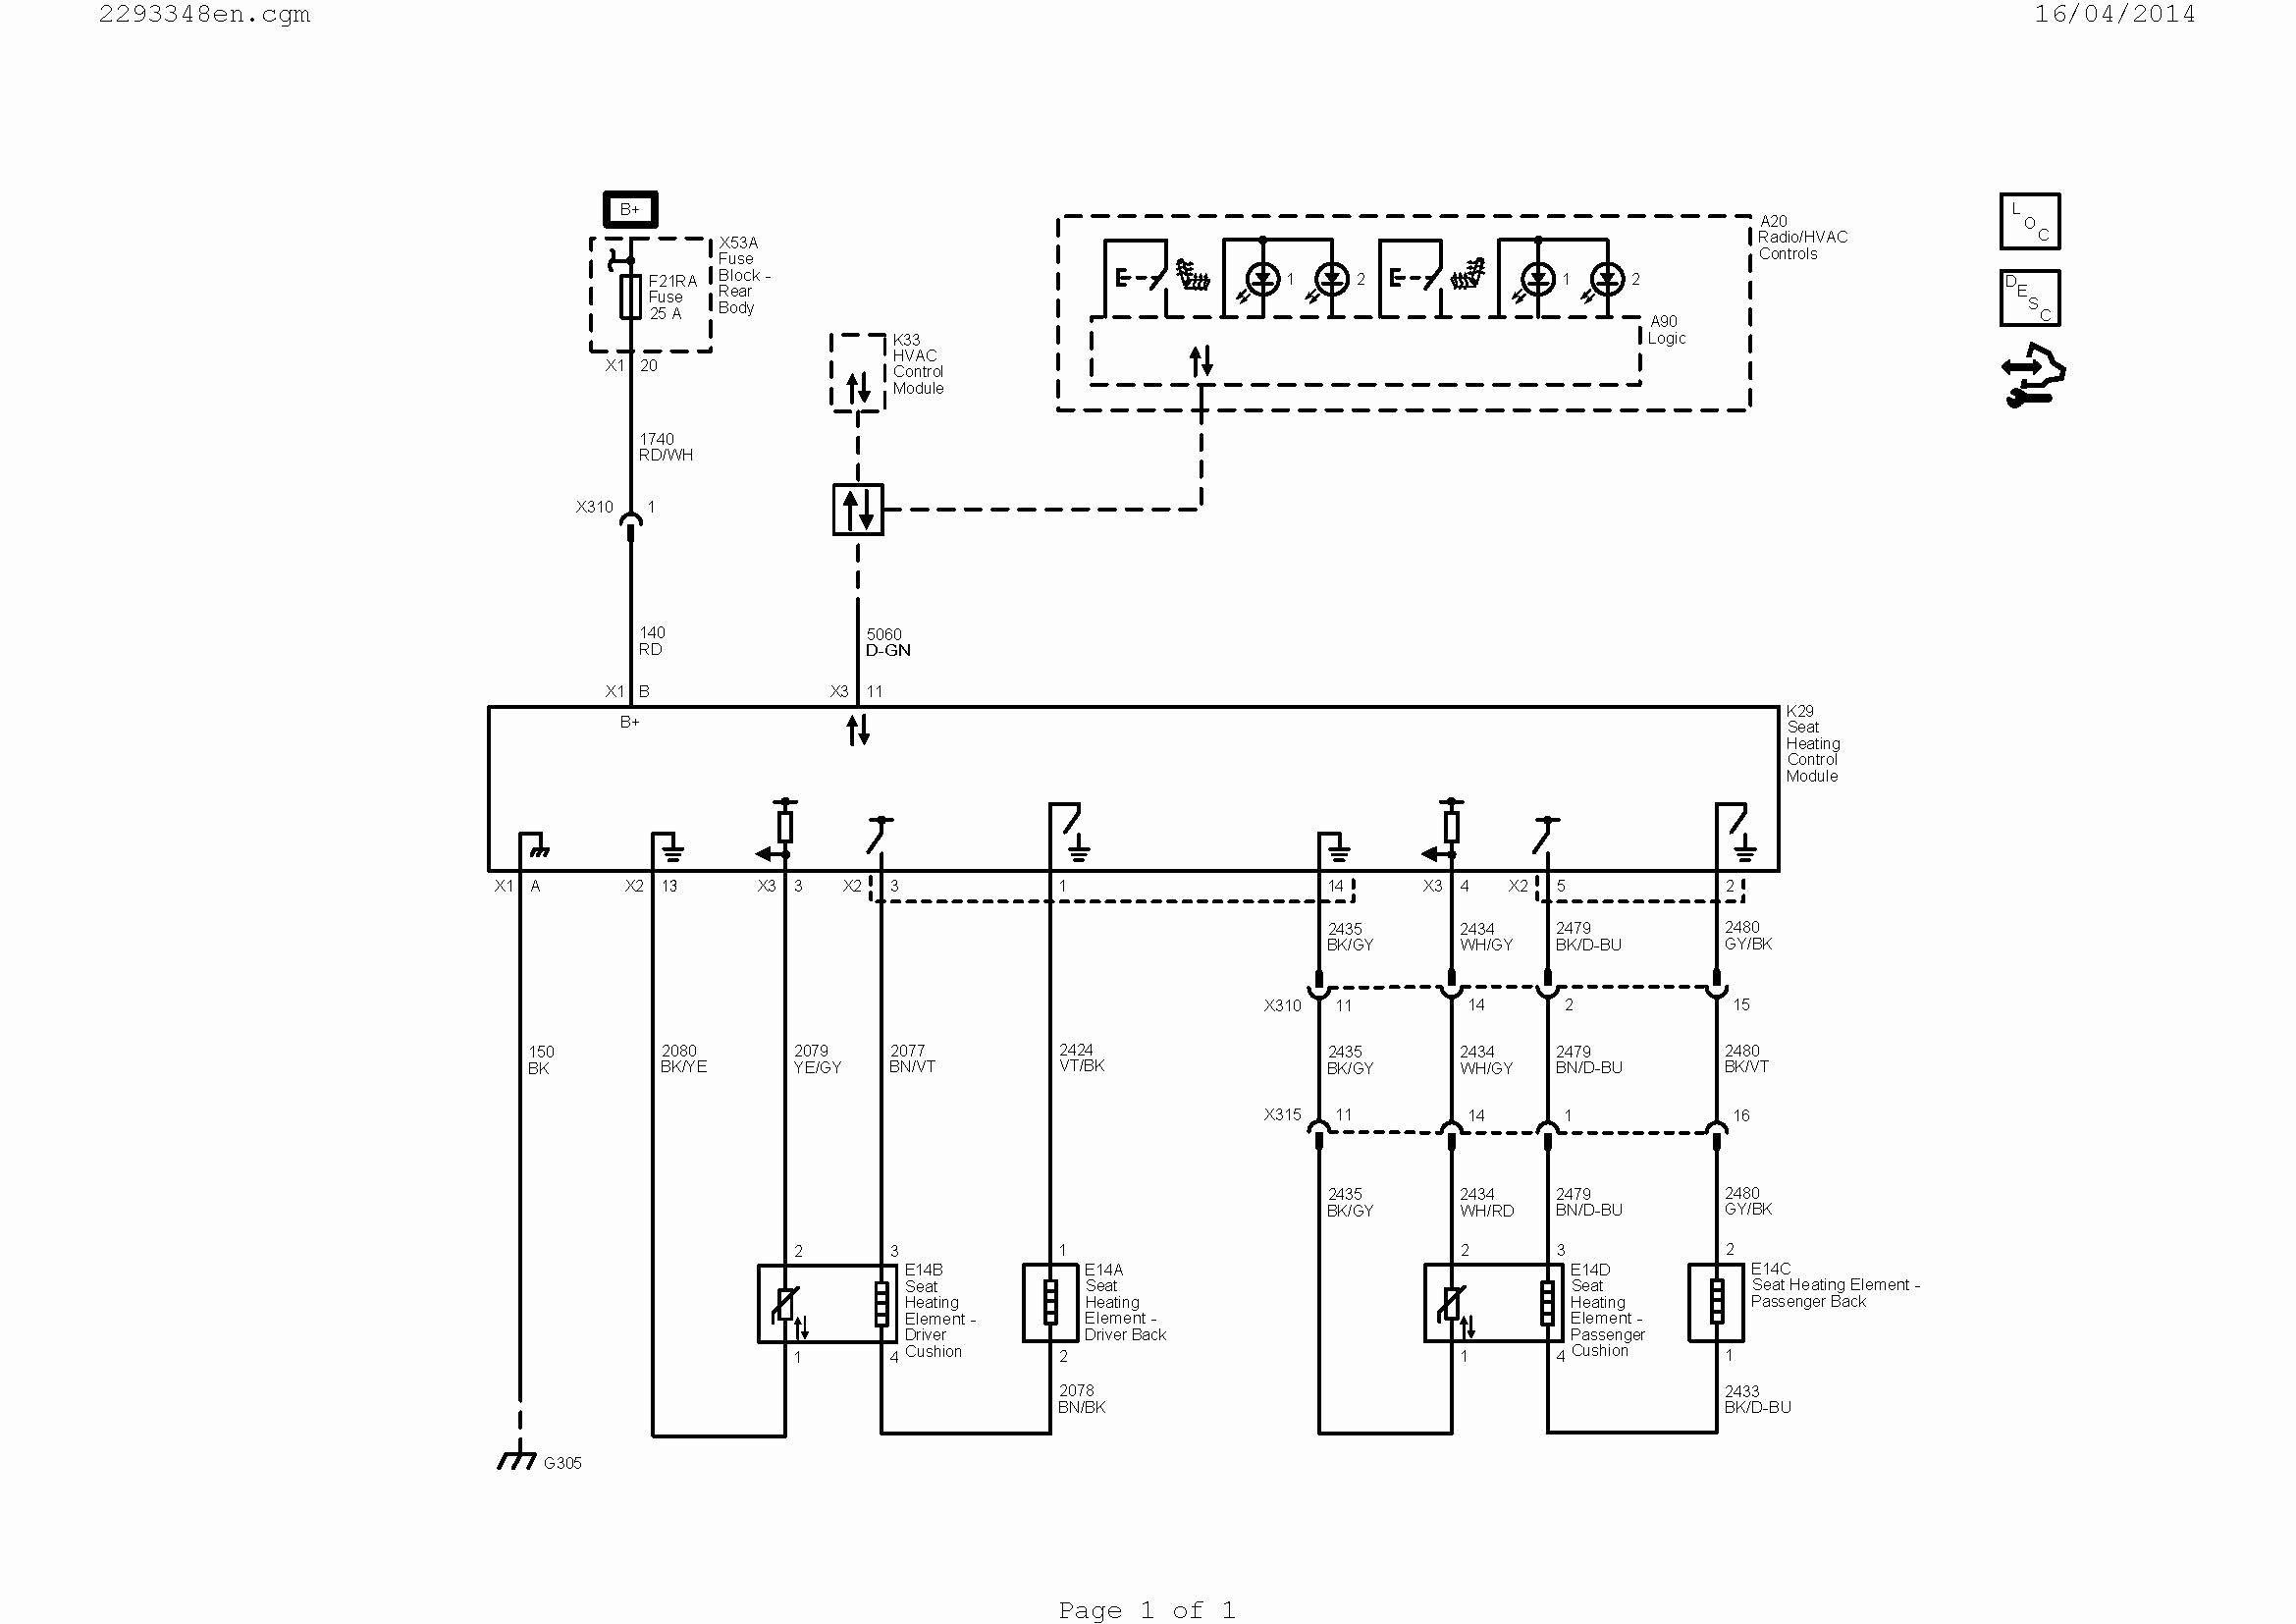 TA_6456] Wiring Diagram Honeywell Dpdt Schematic WiringExpe Kumb Isra Mohammedshrine Librar Wiring 101